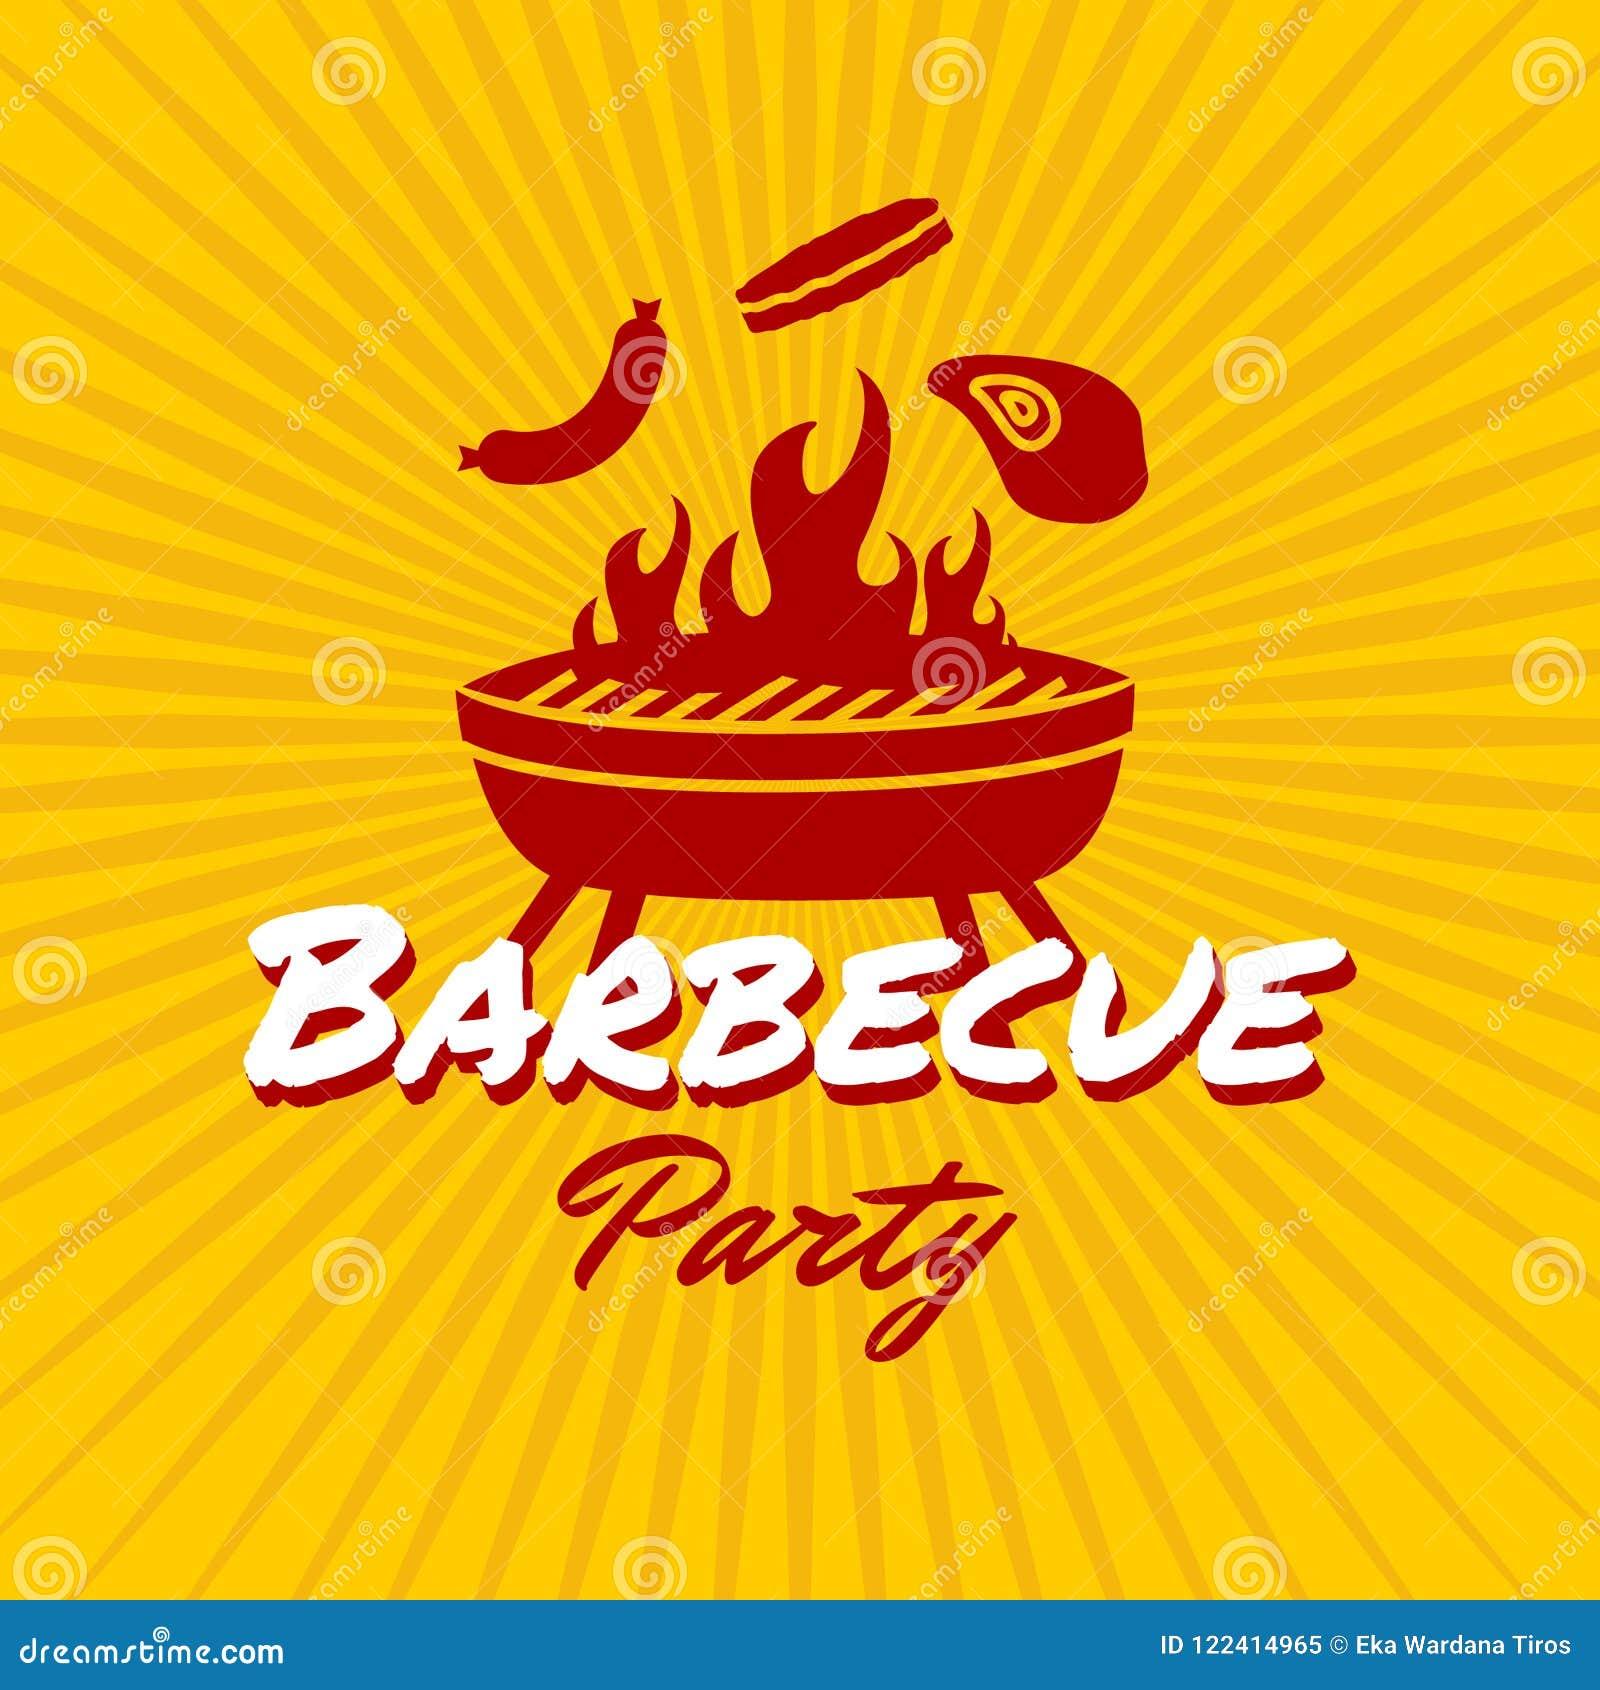 Calibre de logo de partie de barbecue